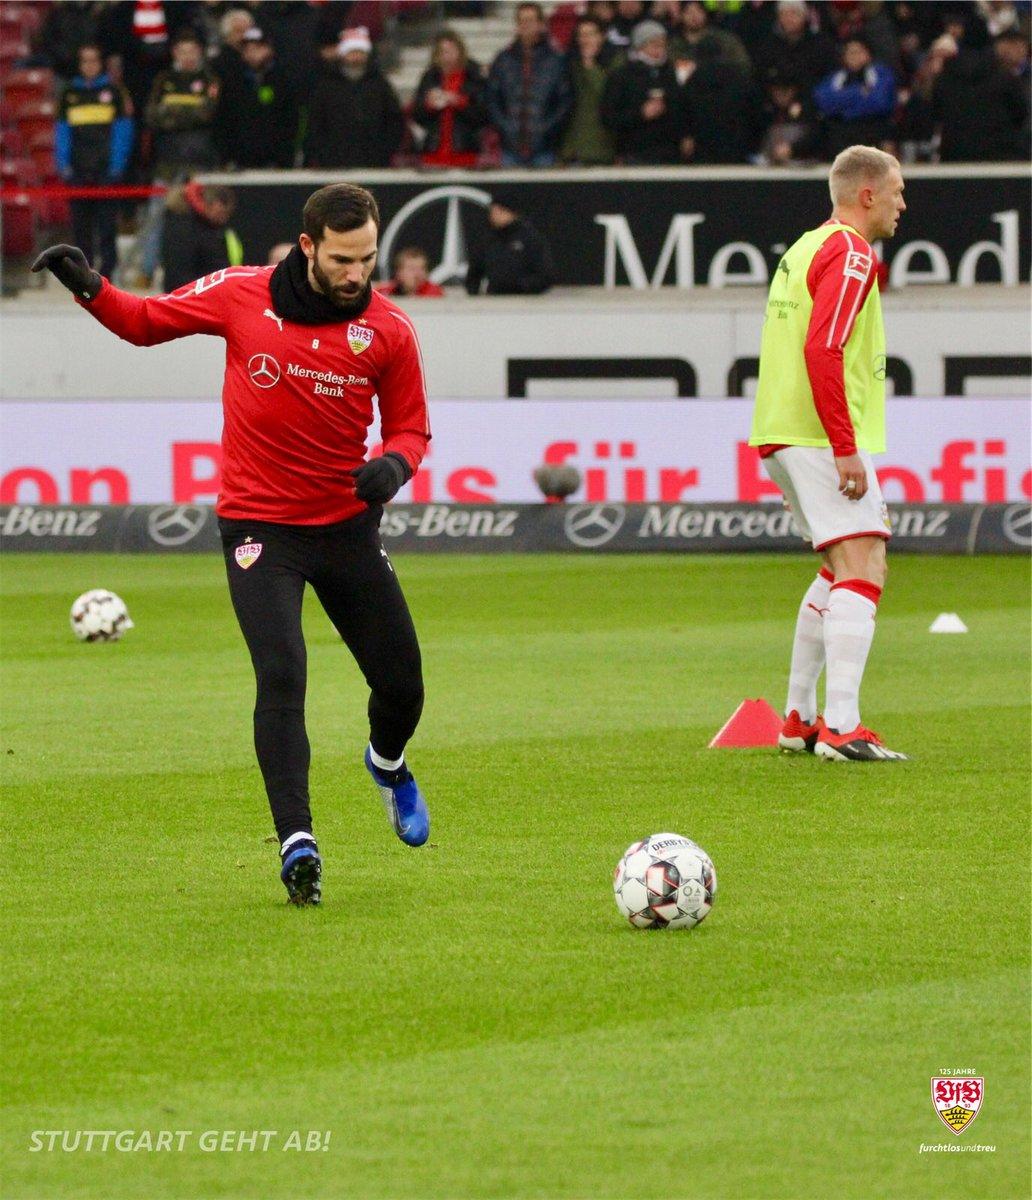 Warm-up  #VfBBSC <br>http://pic.twitter.com/aNBsjtzvBg